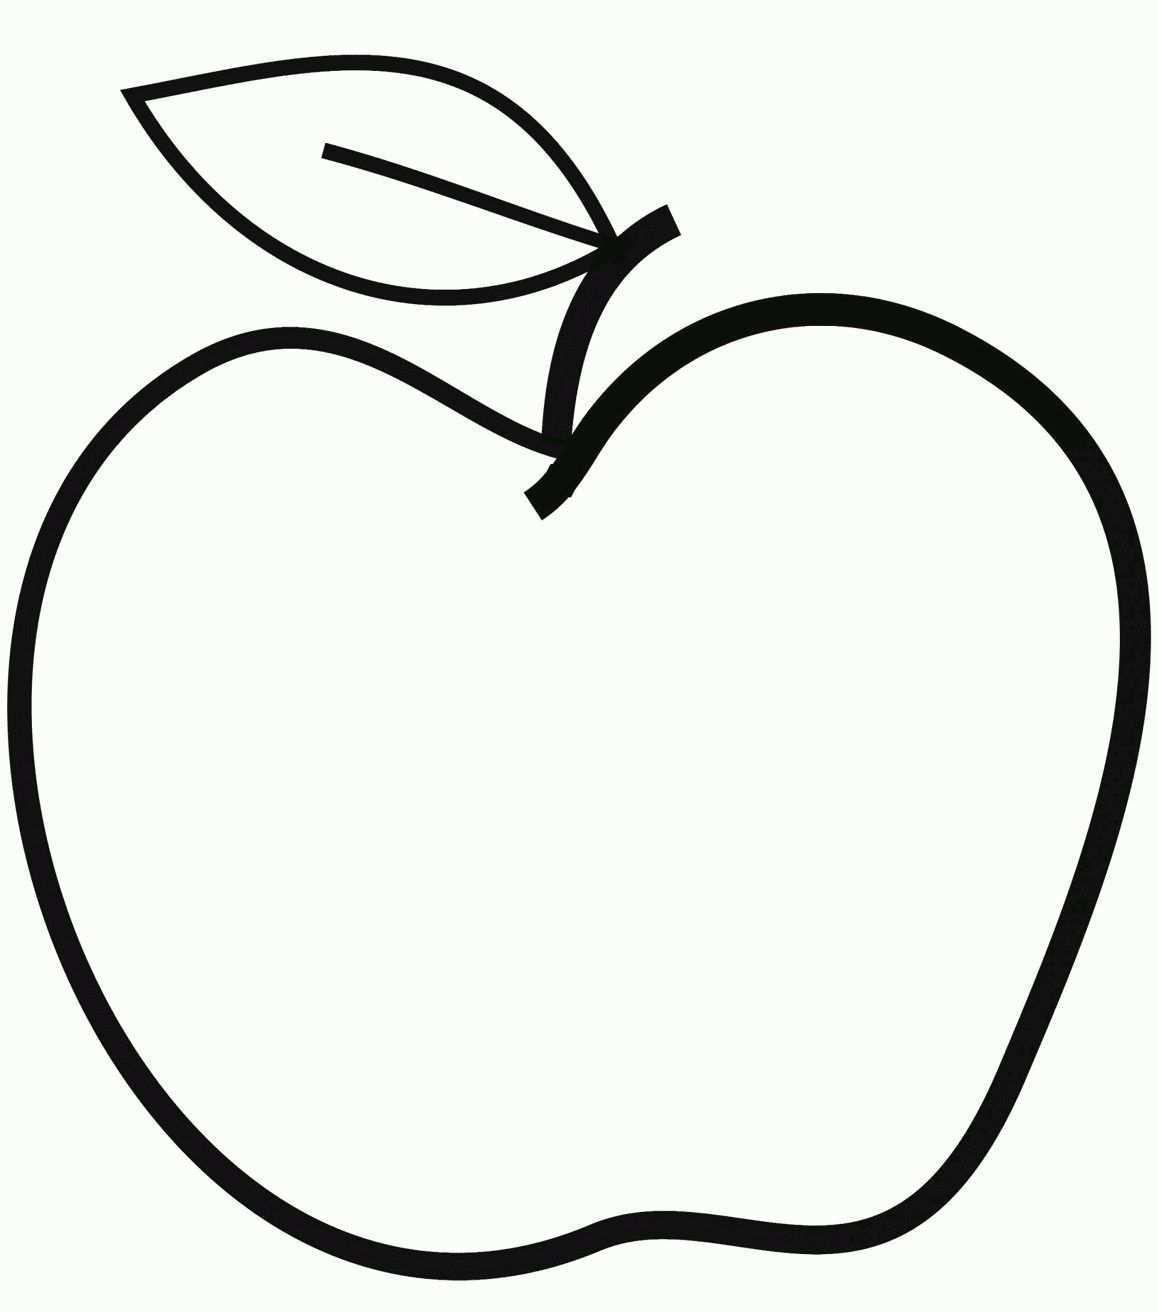 Apfel Bilder Zum Ausdrucken 2938492384234 E1537938370183 Apfel Apple Bilder Color Coloring Bilder Zum Ausdrucken Schablonen Zum Ausdrucken Apfel Bilder